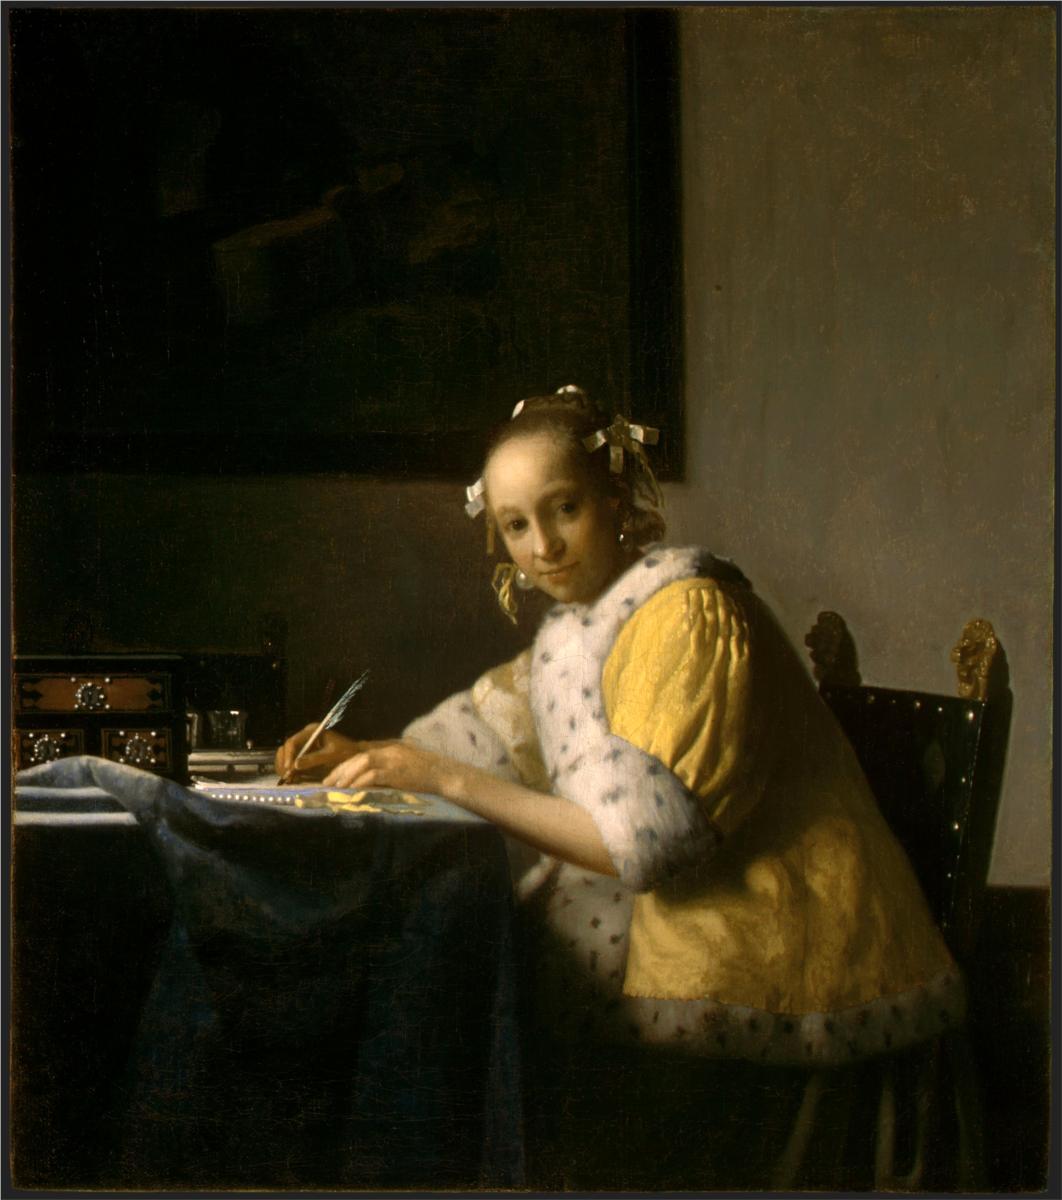 michelangelo and jan vermeer essay Fiction inspired by painting 2d truism, text structure, or essay 3  michelangelo  jean francois millet joan miro  jan vermeer leonardo da vinci andy warhol.